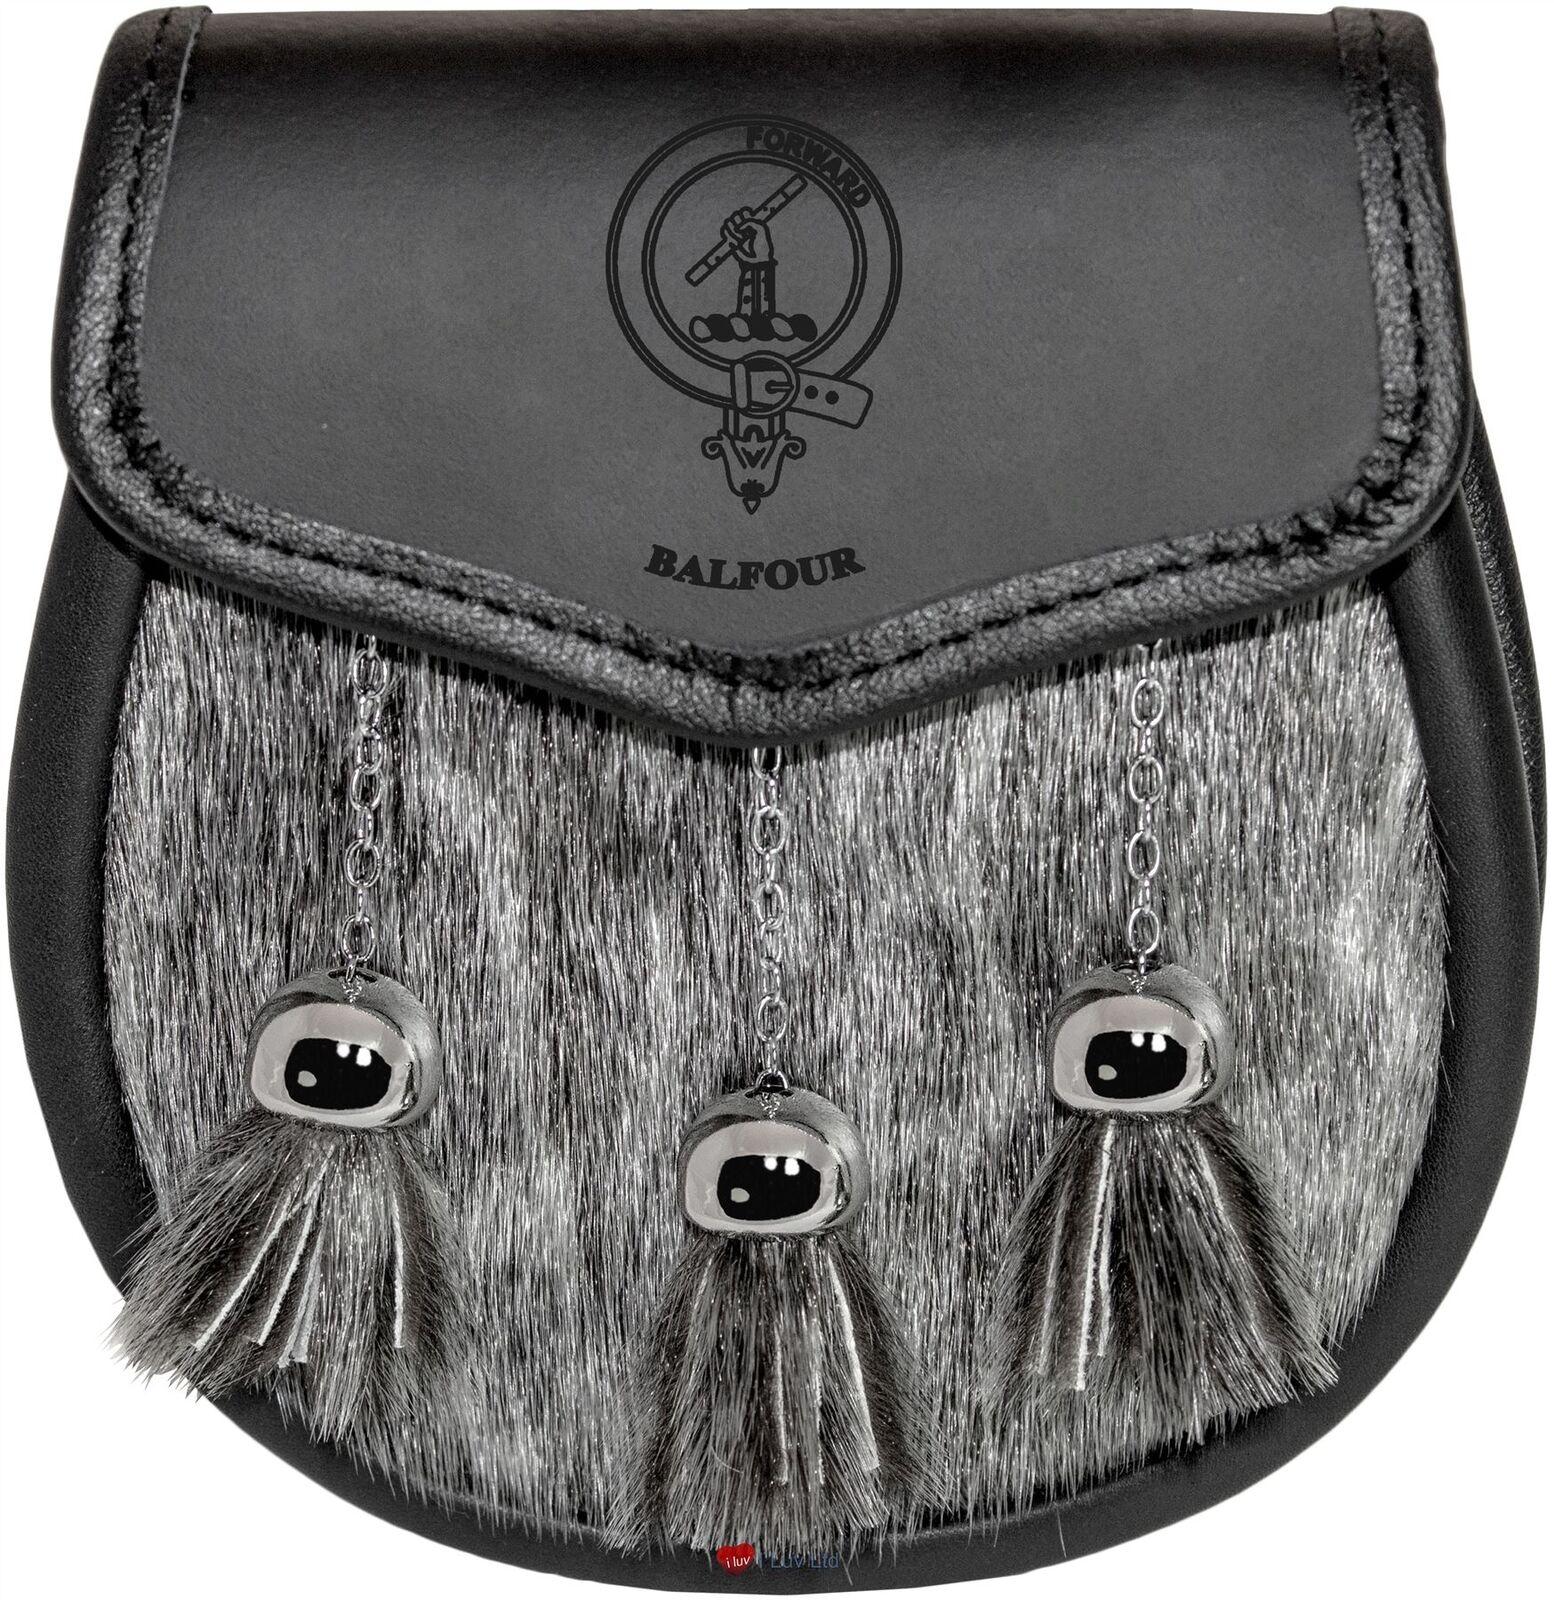 Balfour Semi Dress Sporran Fur Plain Leather Flap Scottish Clan Crest